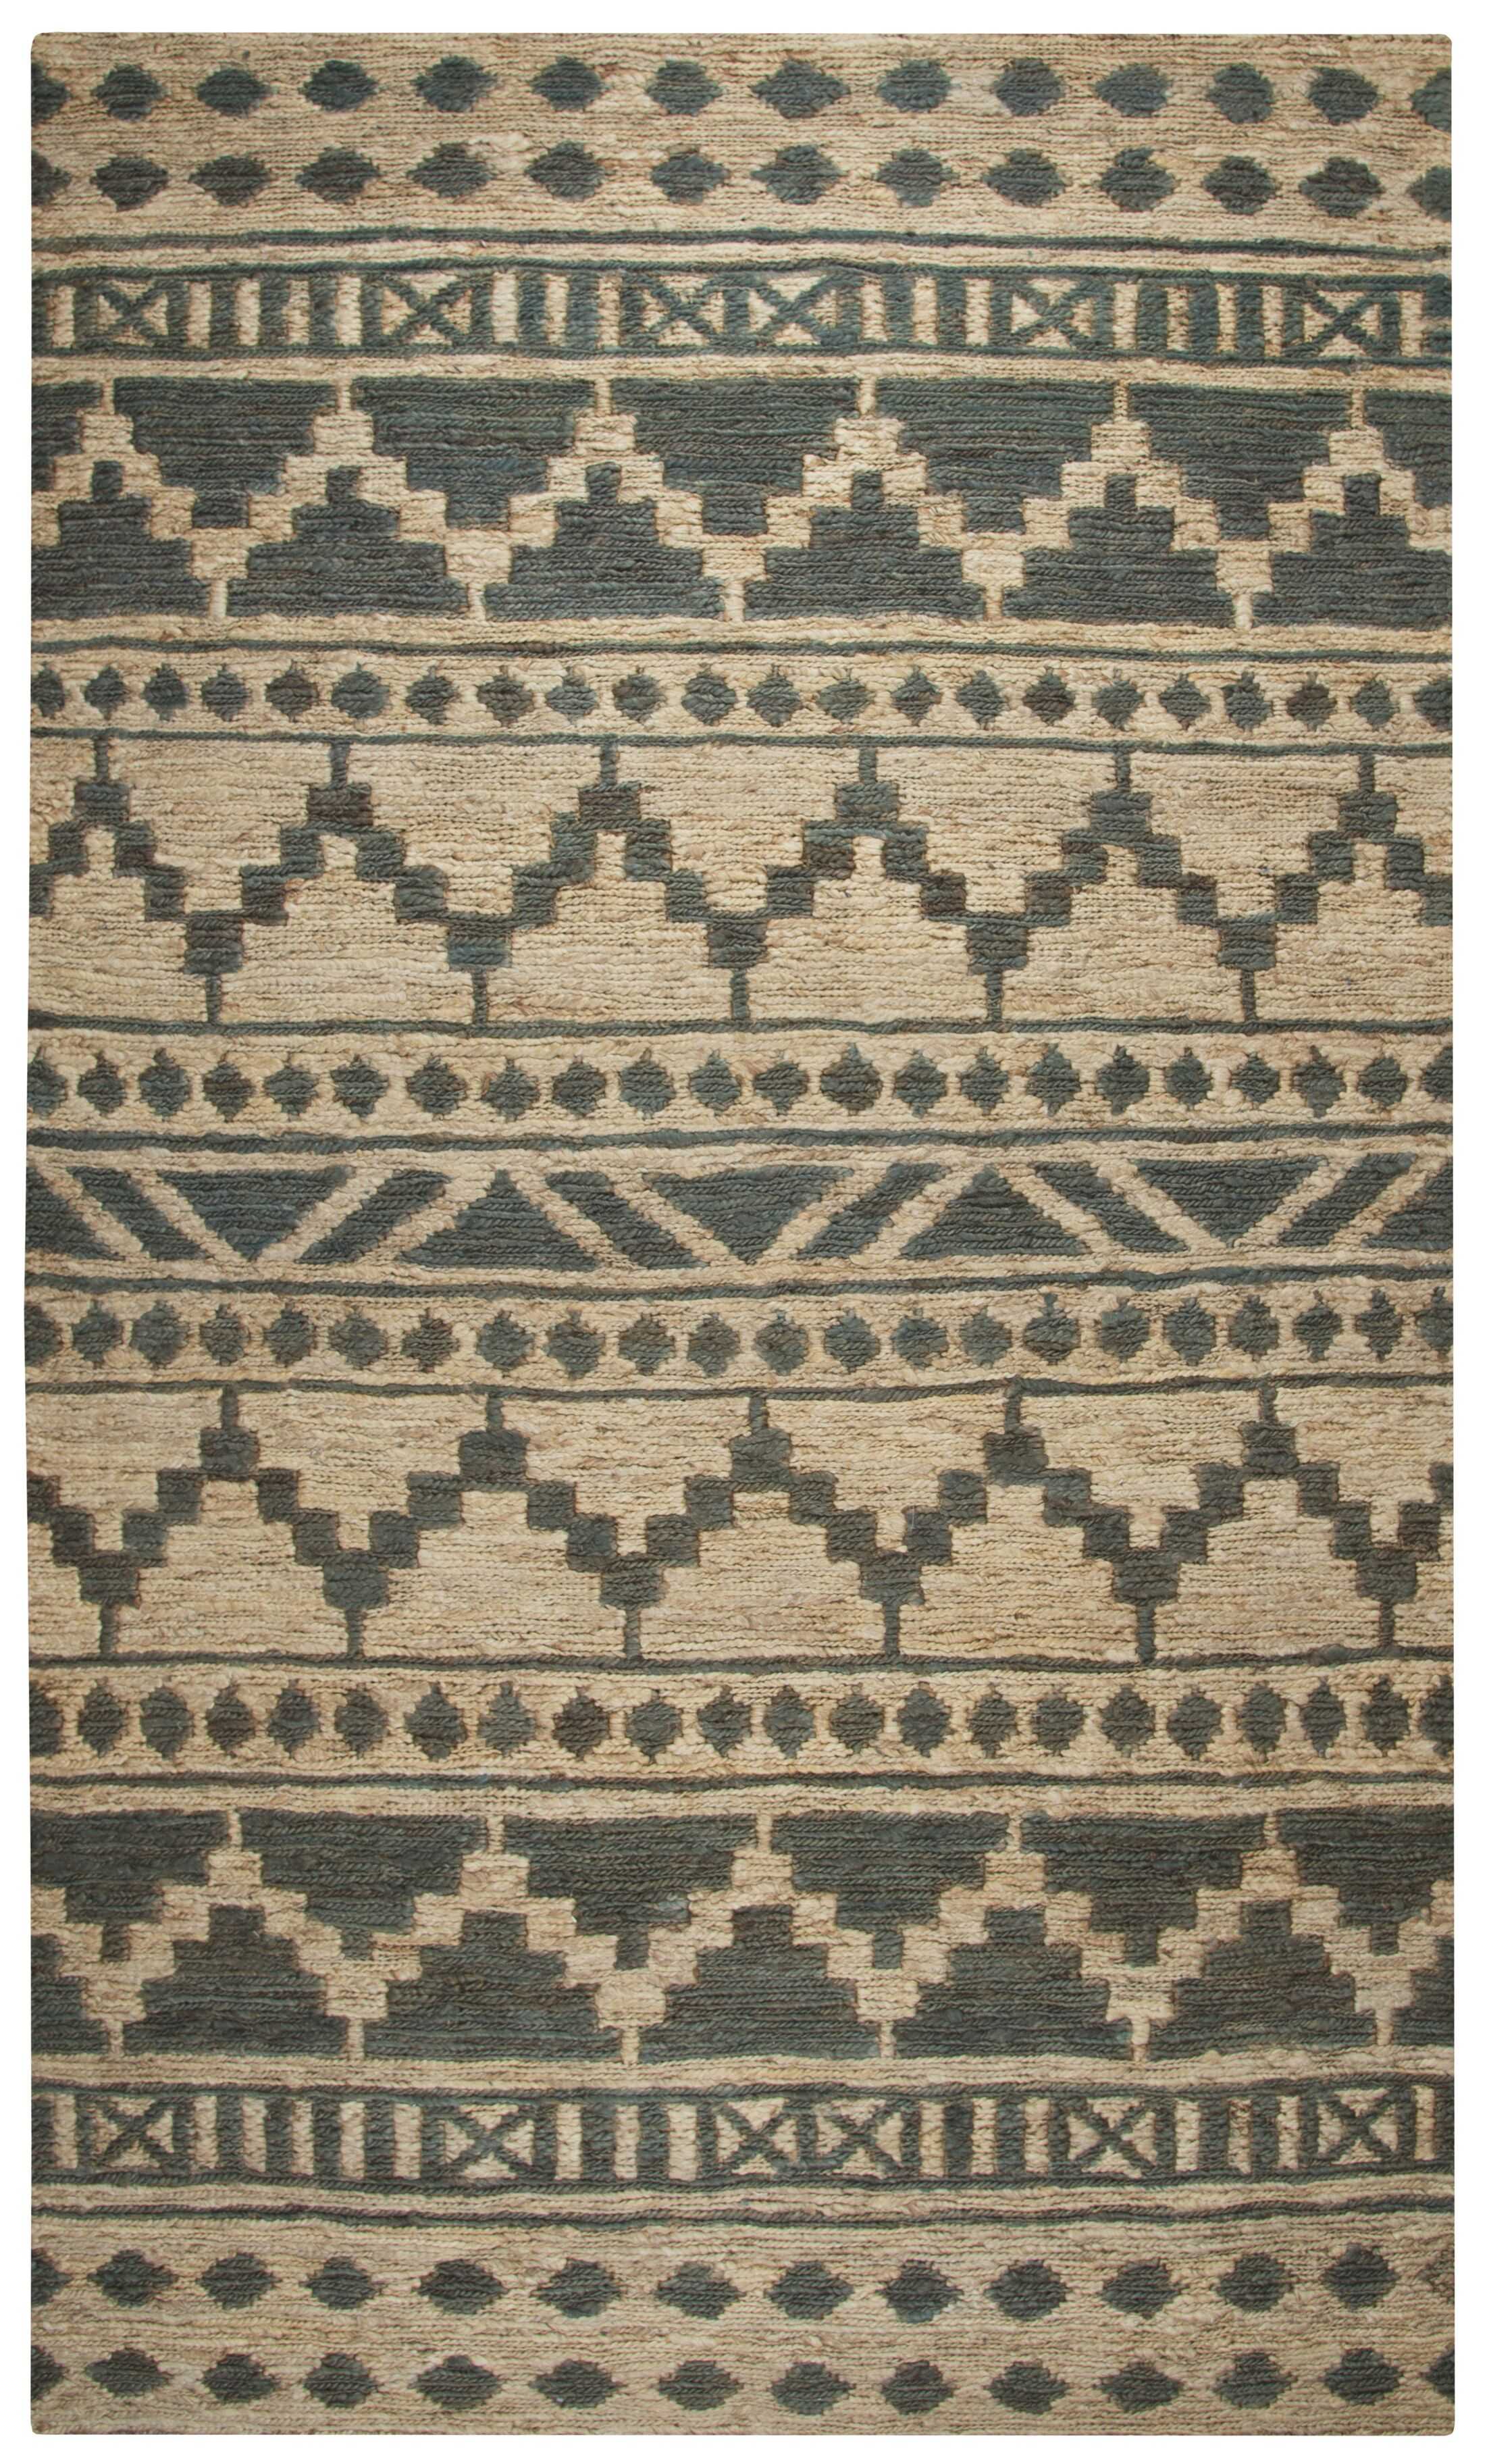 Rayna Hand-Woven Area Rug Rug Size: Rectangle 9' x 12'